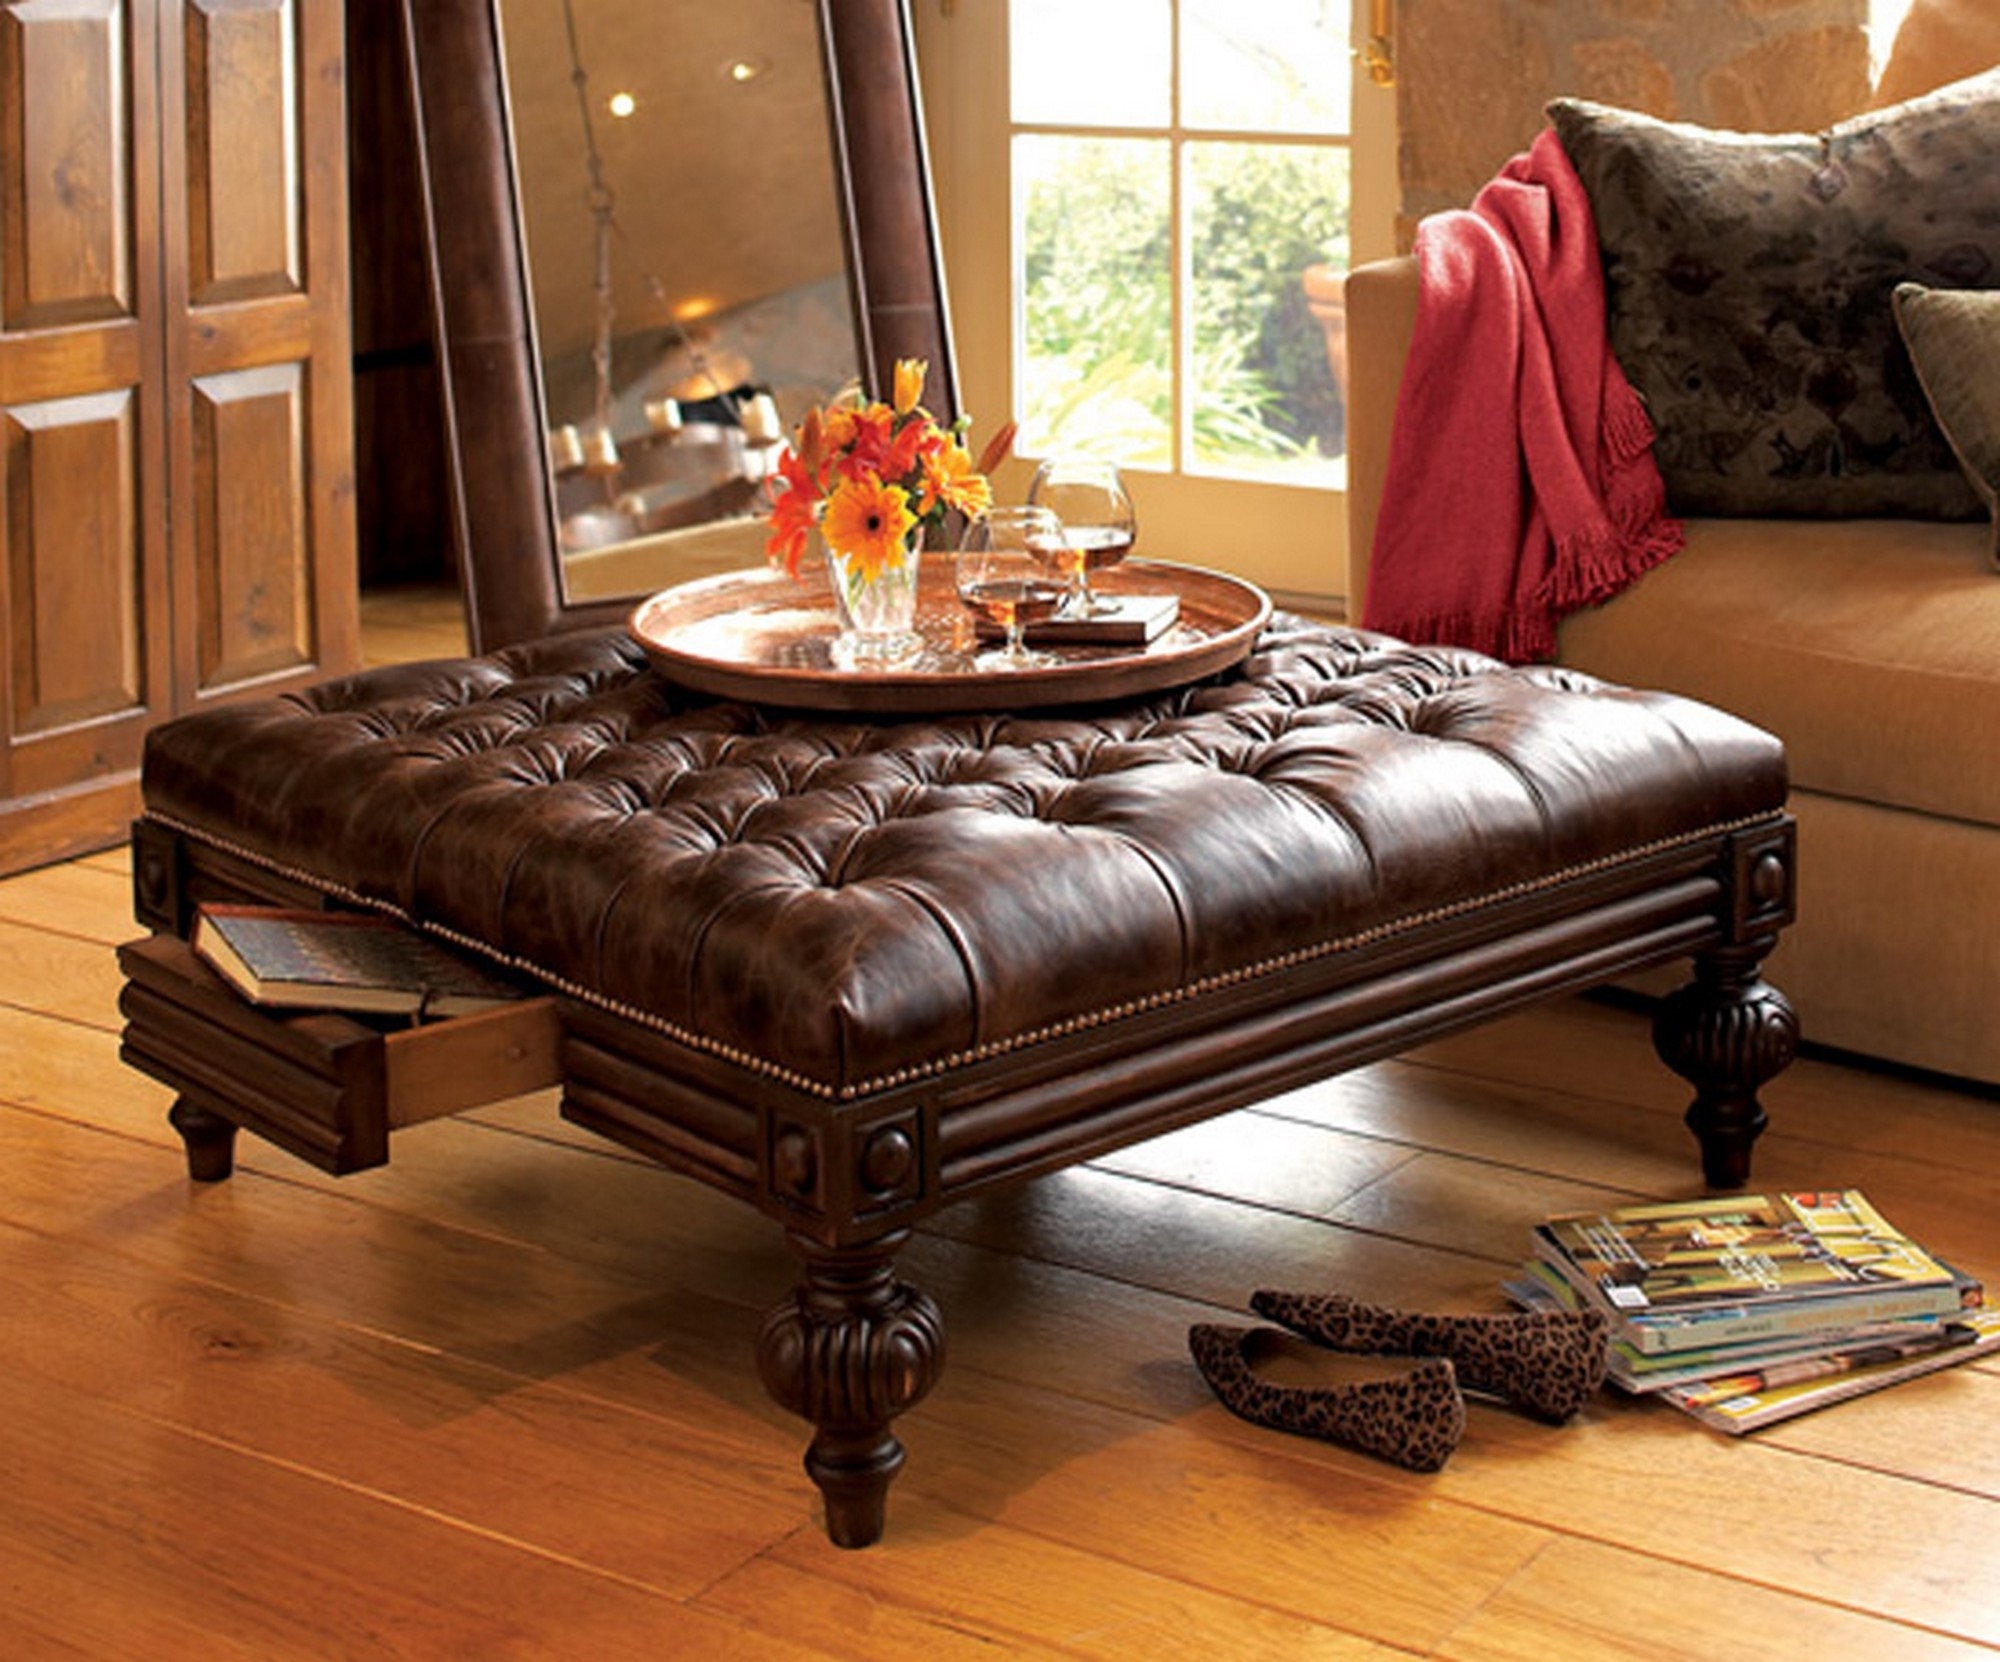 Fullsize Of Round Ottoman Coffee Table